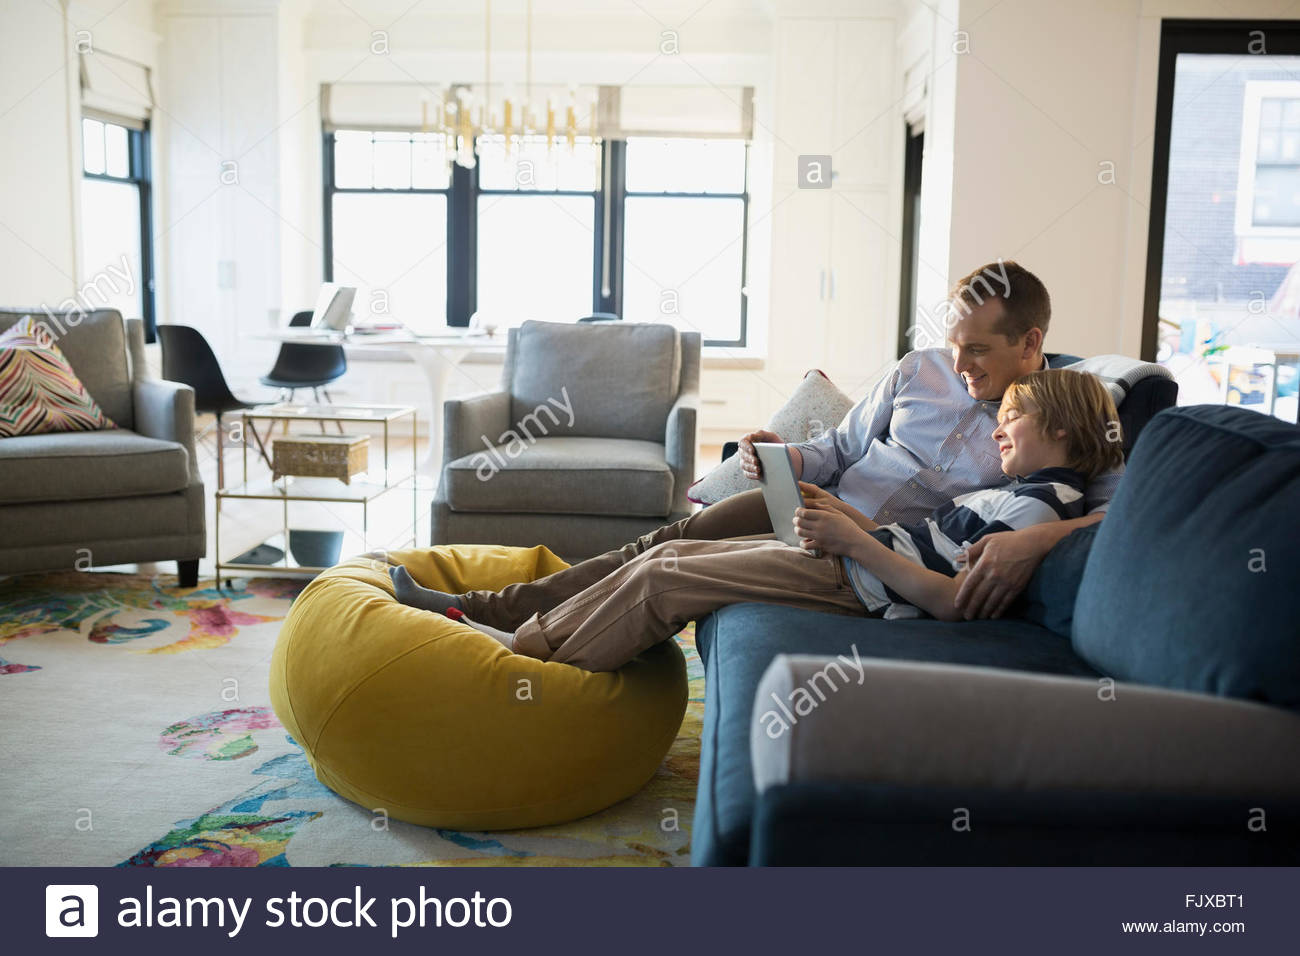 Father son sharing digital tablet living room sofa - Stock Image